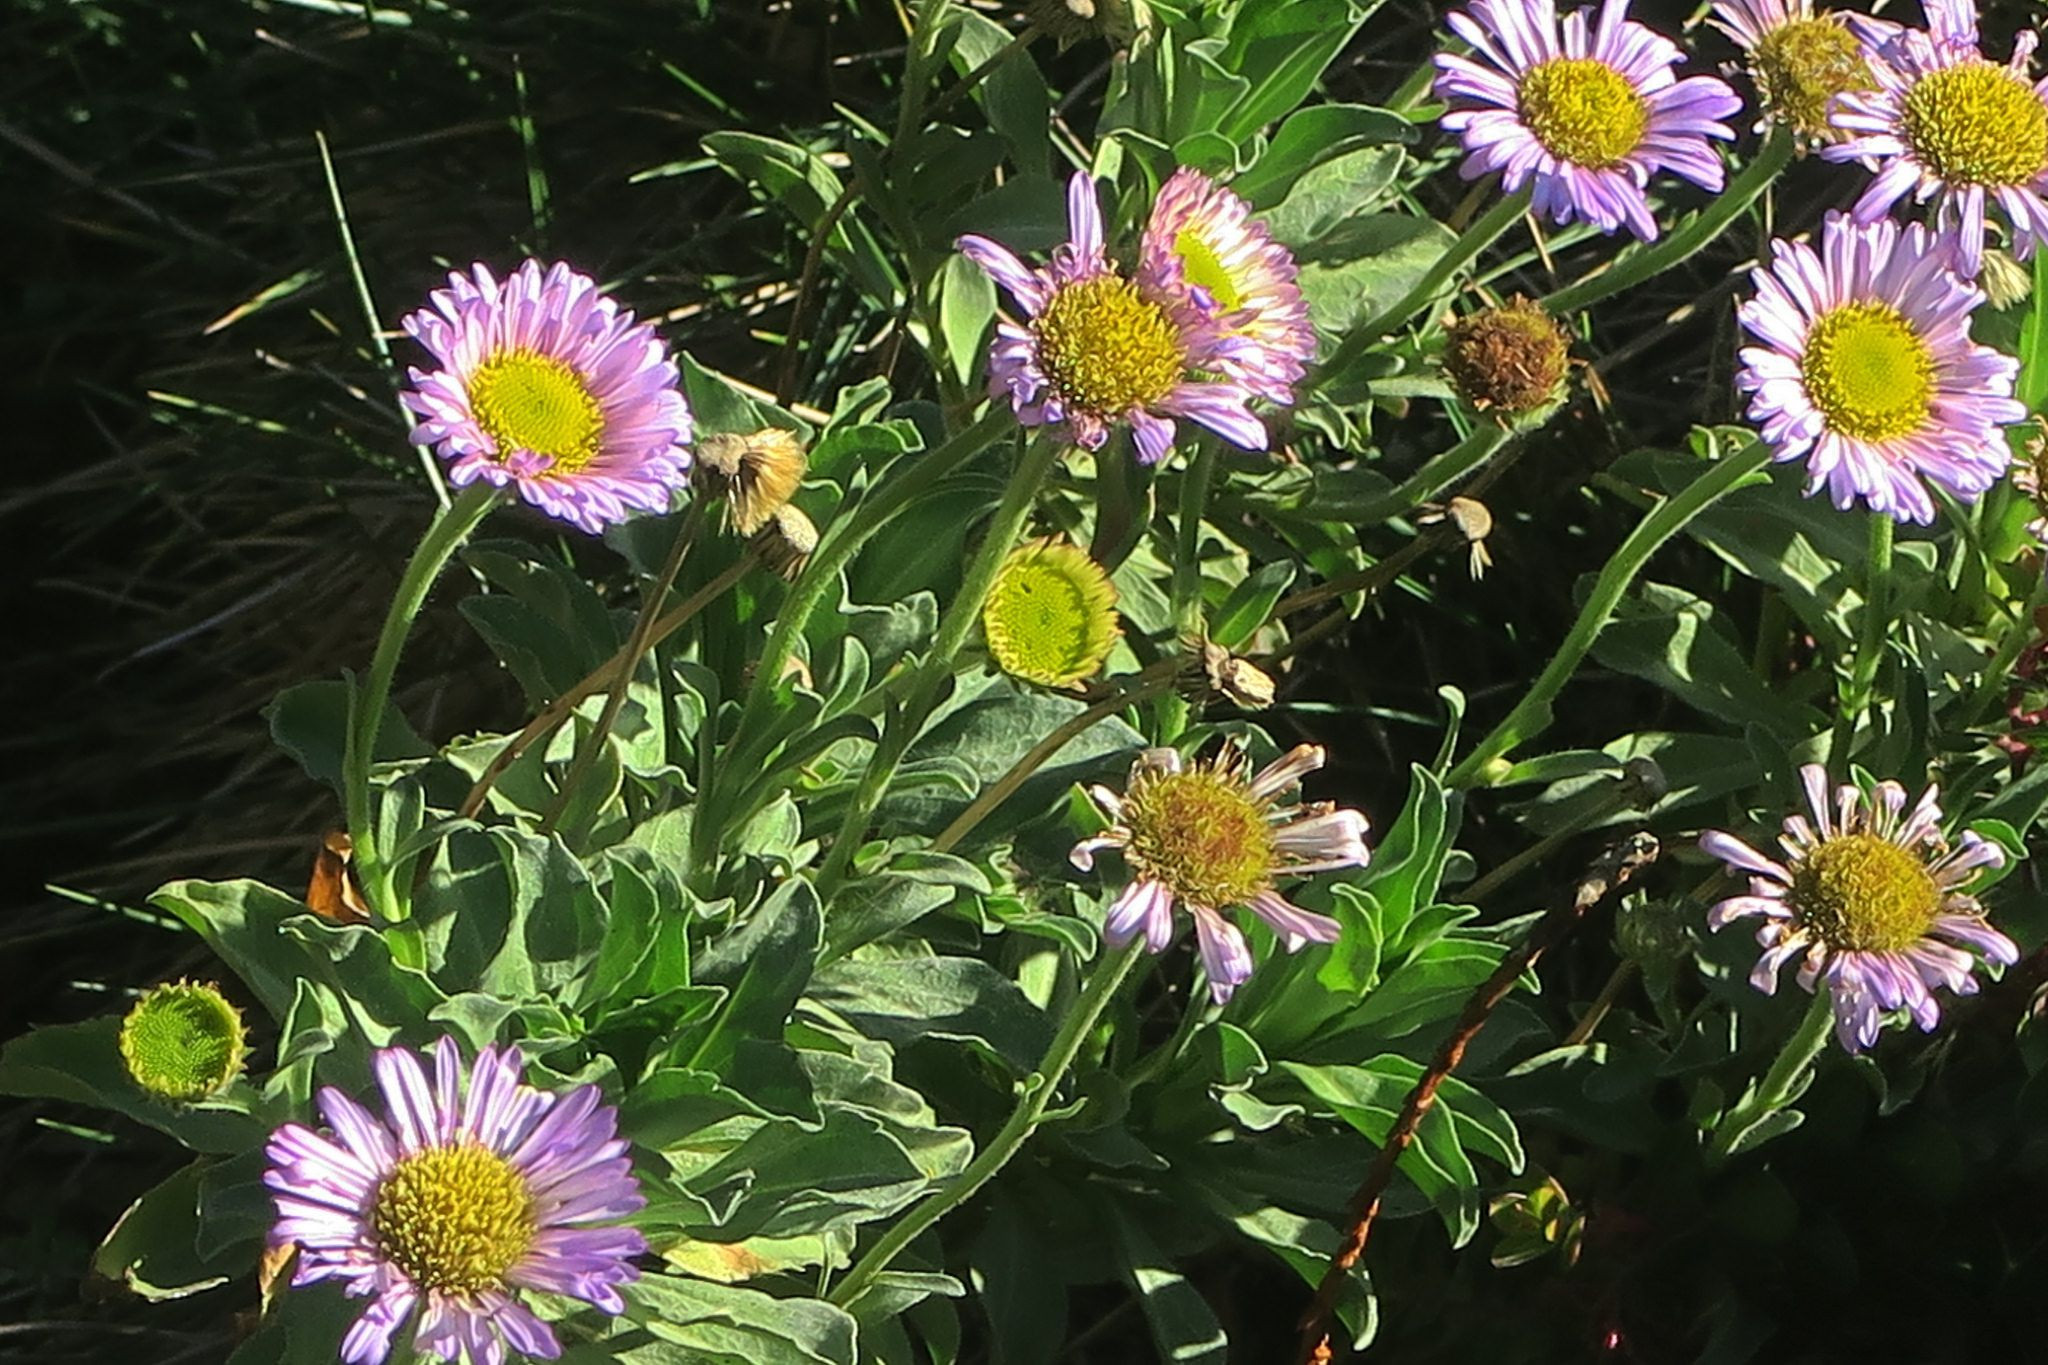 Erigeron glaucus—seaside daisy Regional Parks Botanic Garden Picture of the Day 4 Dec 17